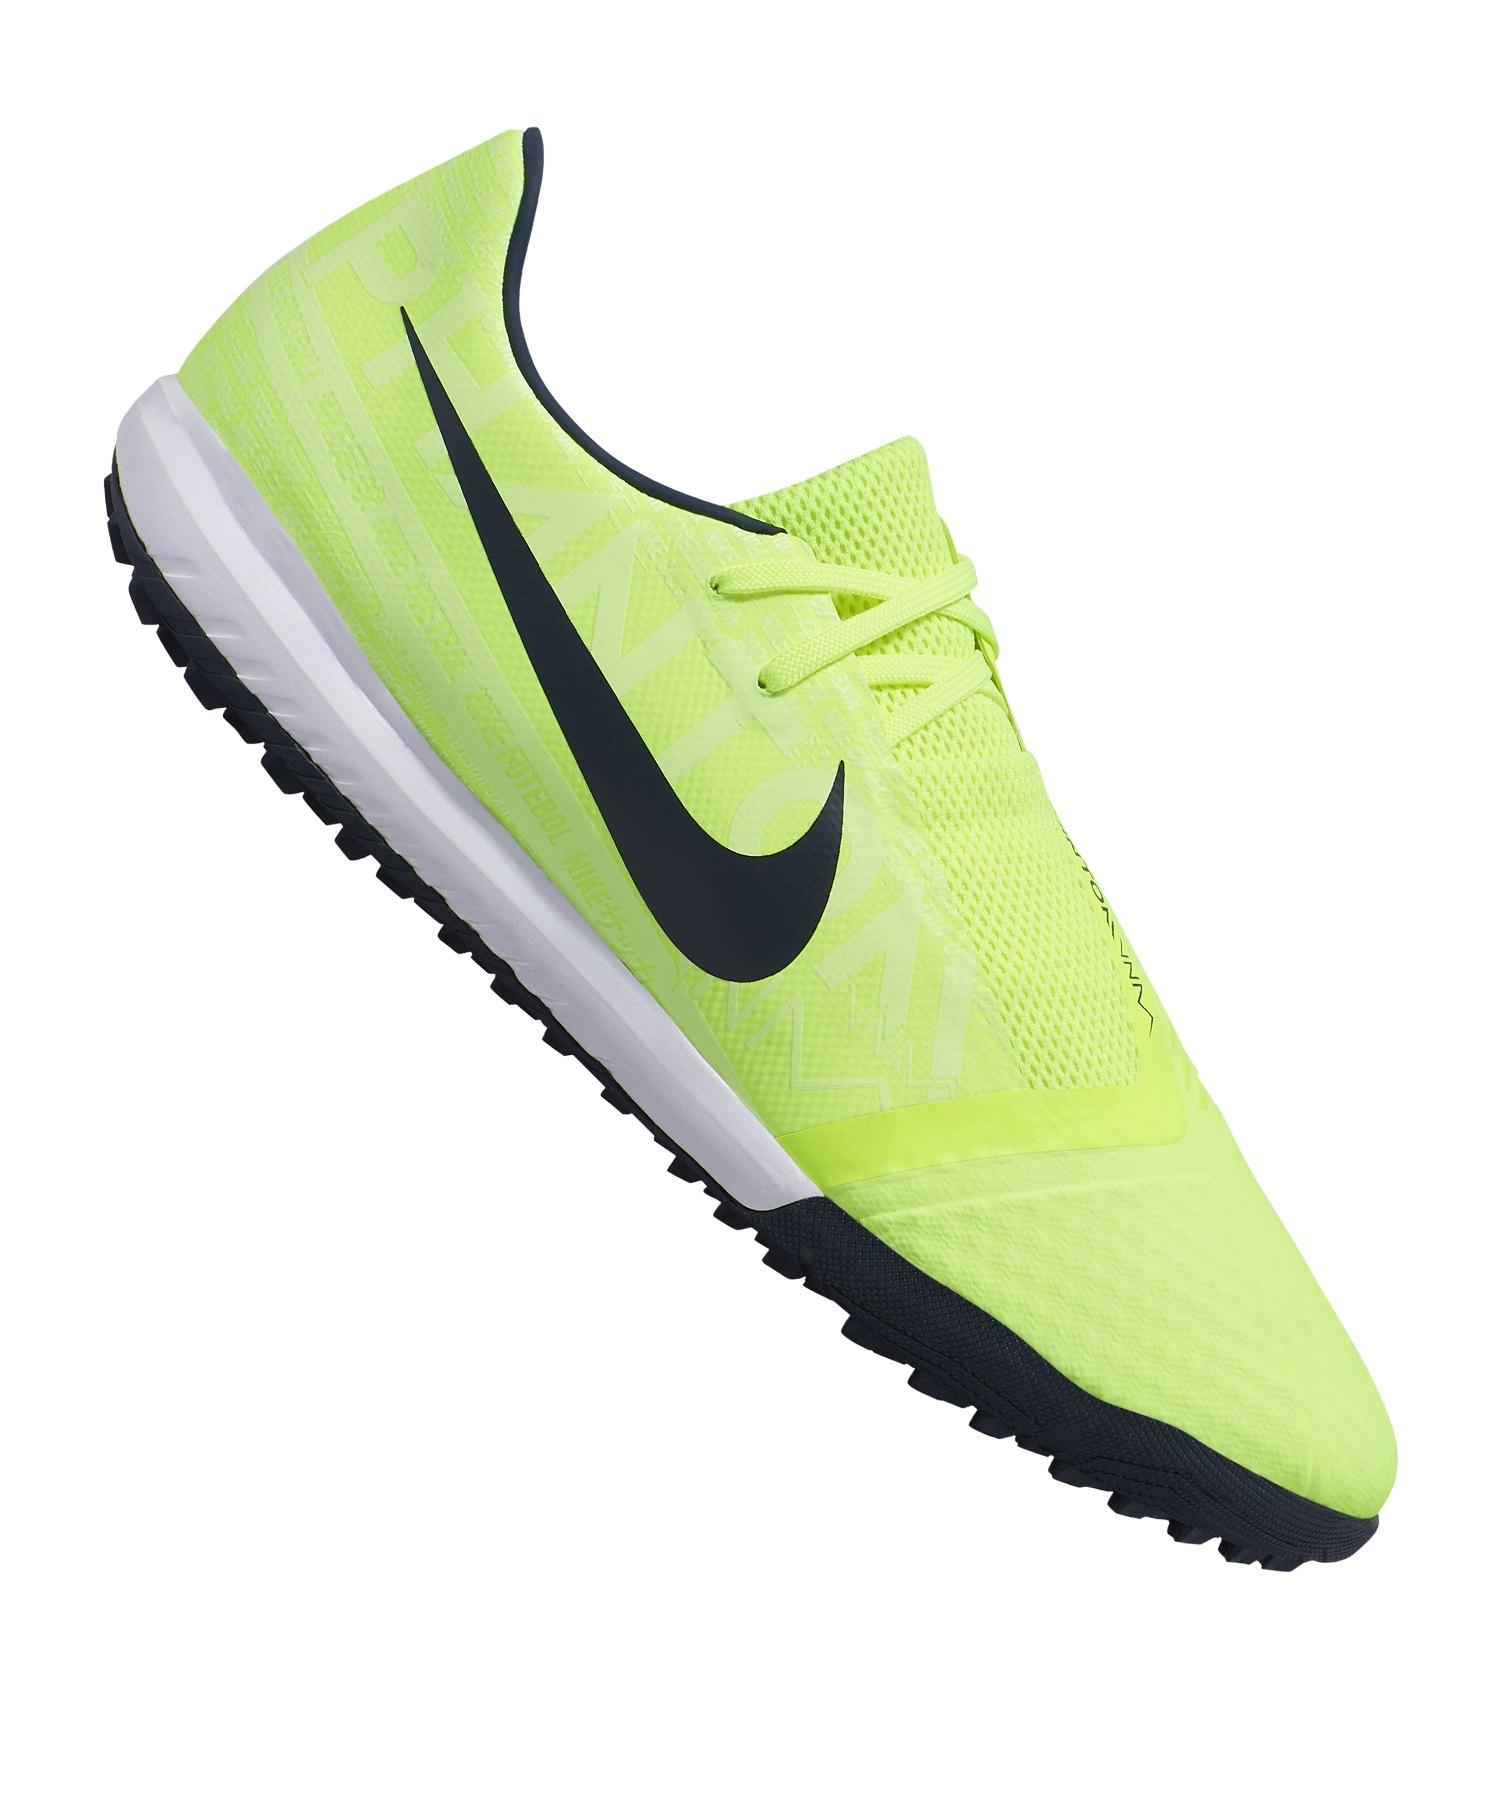 Schuhe Fussball Kinder Nike Mercurial Victory VI TF GelbSchwarz